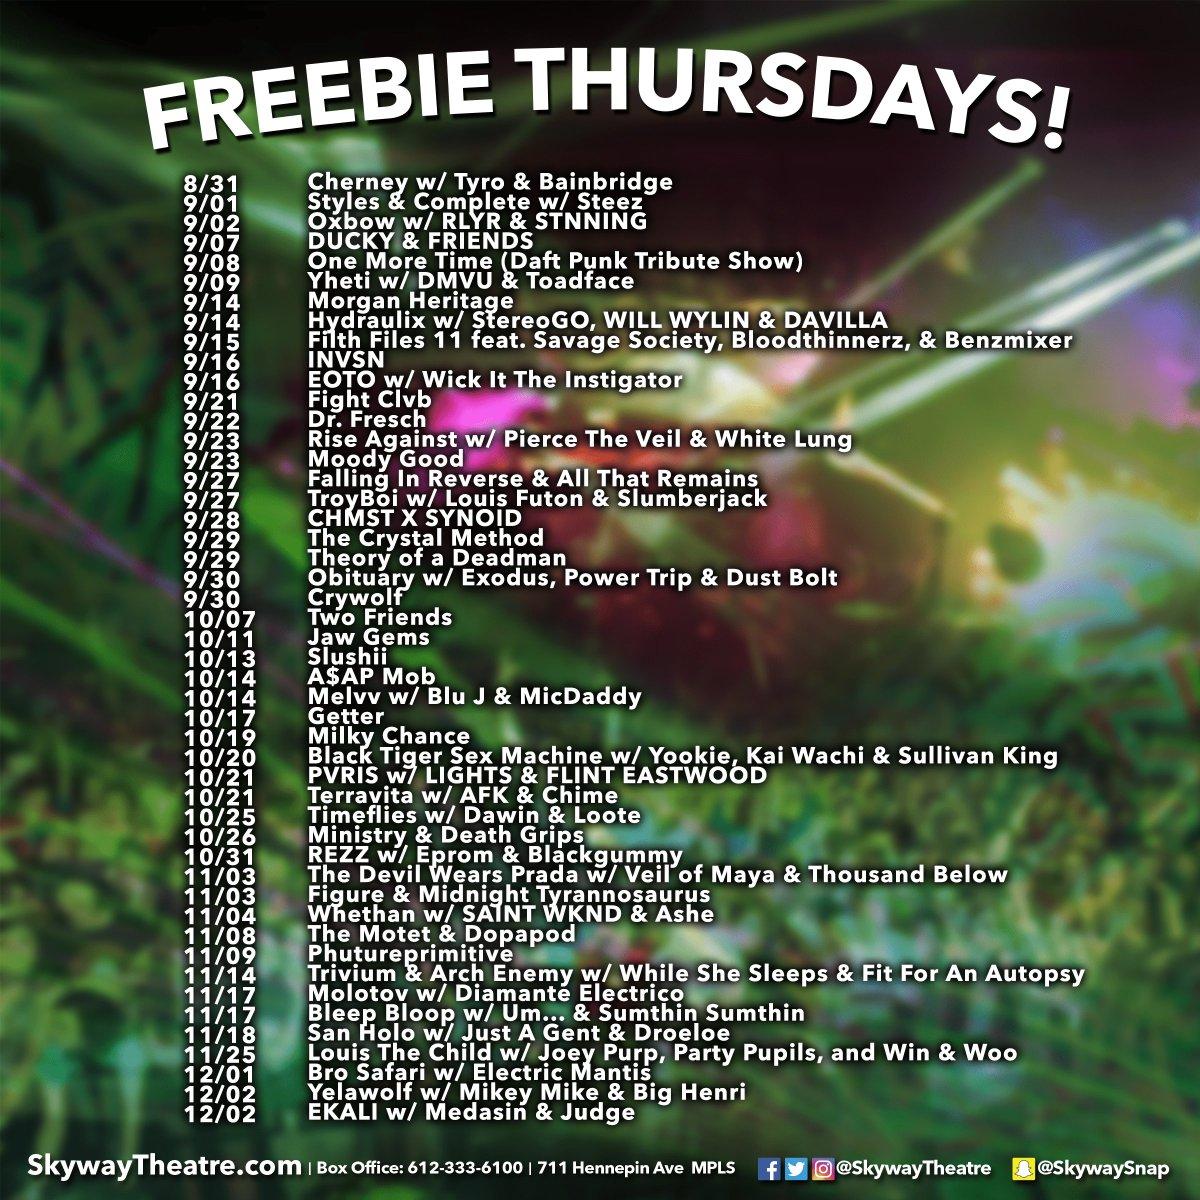 Skyway Theatre On Twitter Freebie Thursday Win A Pair Of Tix 2 Show Follow Us Retweet Pick Tag Friend